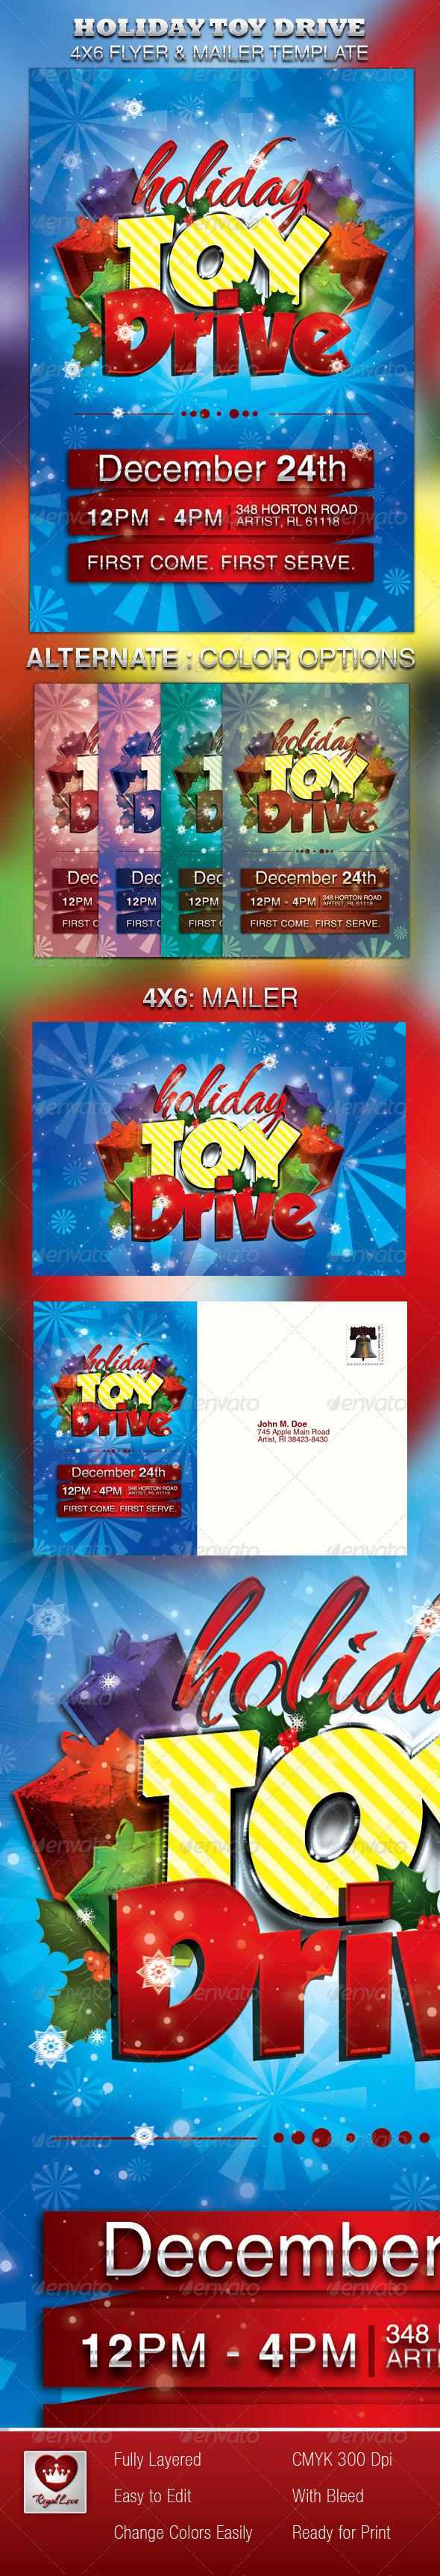 holiday toy drive flyer mailer graphicriver. Black Bedroom Furniture Sets. Home Design Ideas